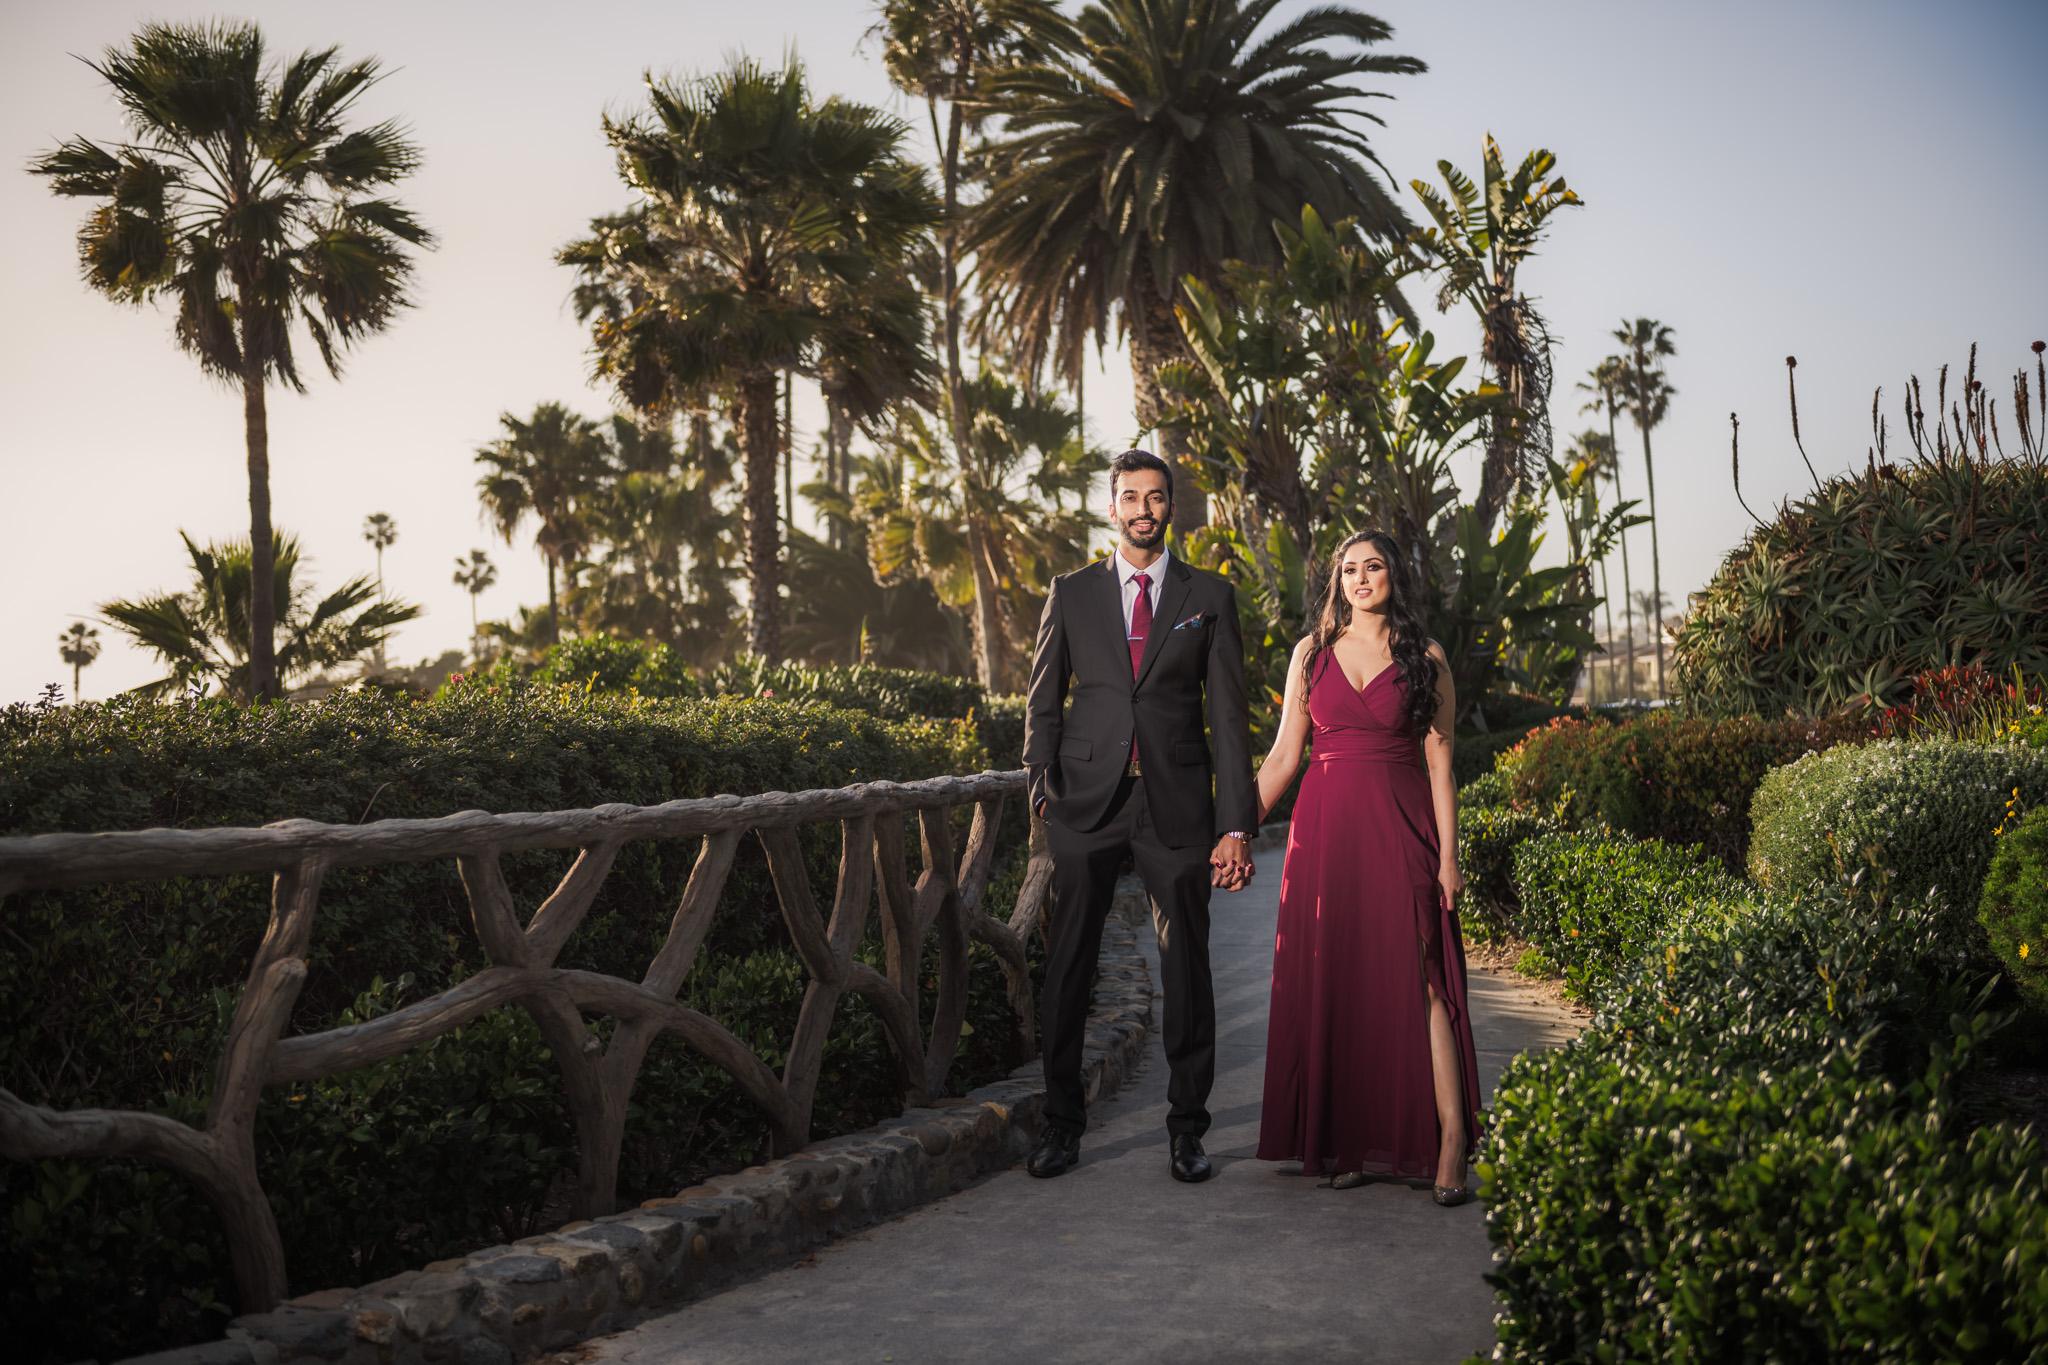 04 Heisler Park Laguna Beach Engagement Photography